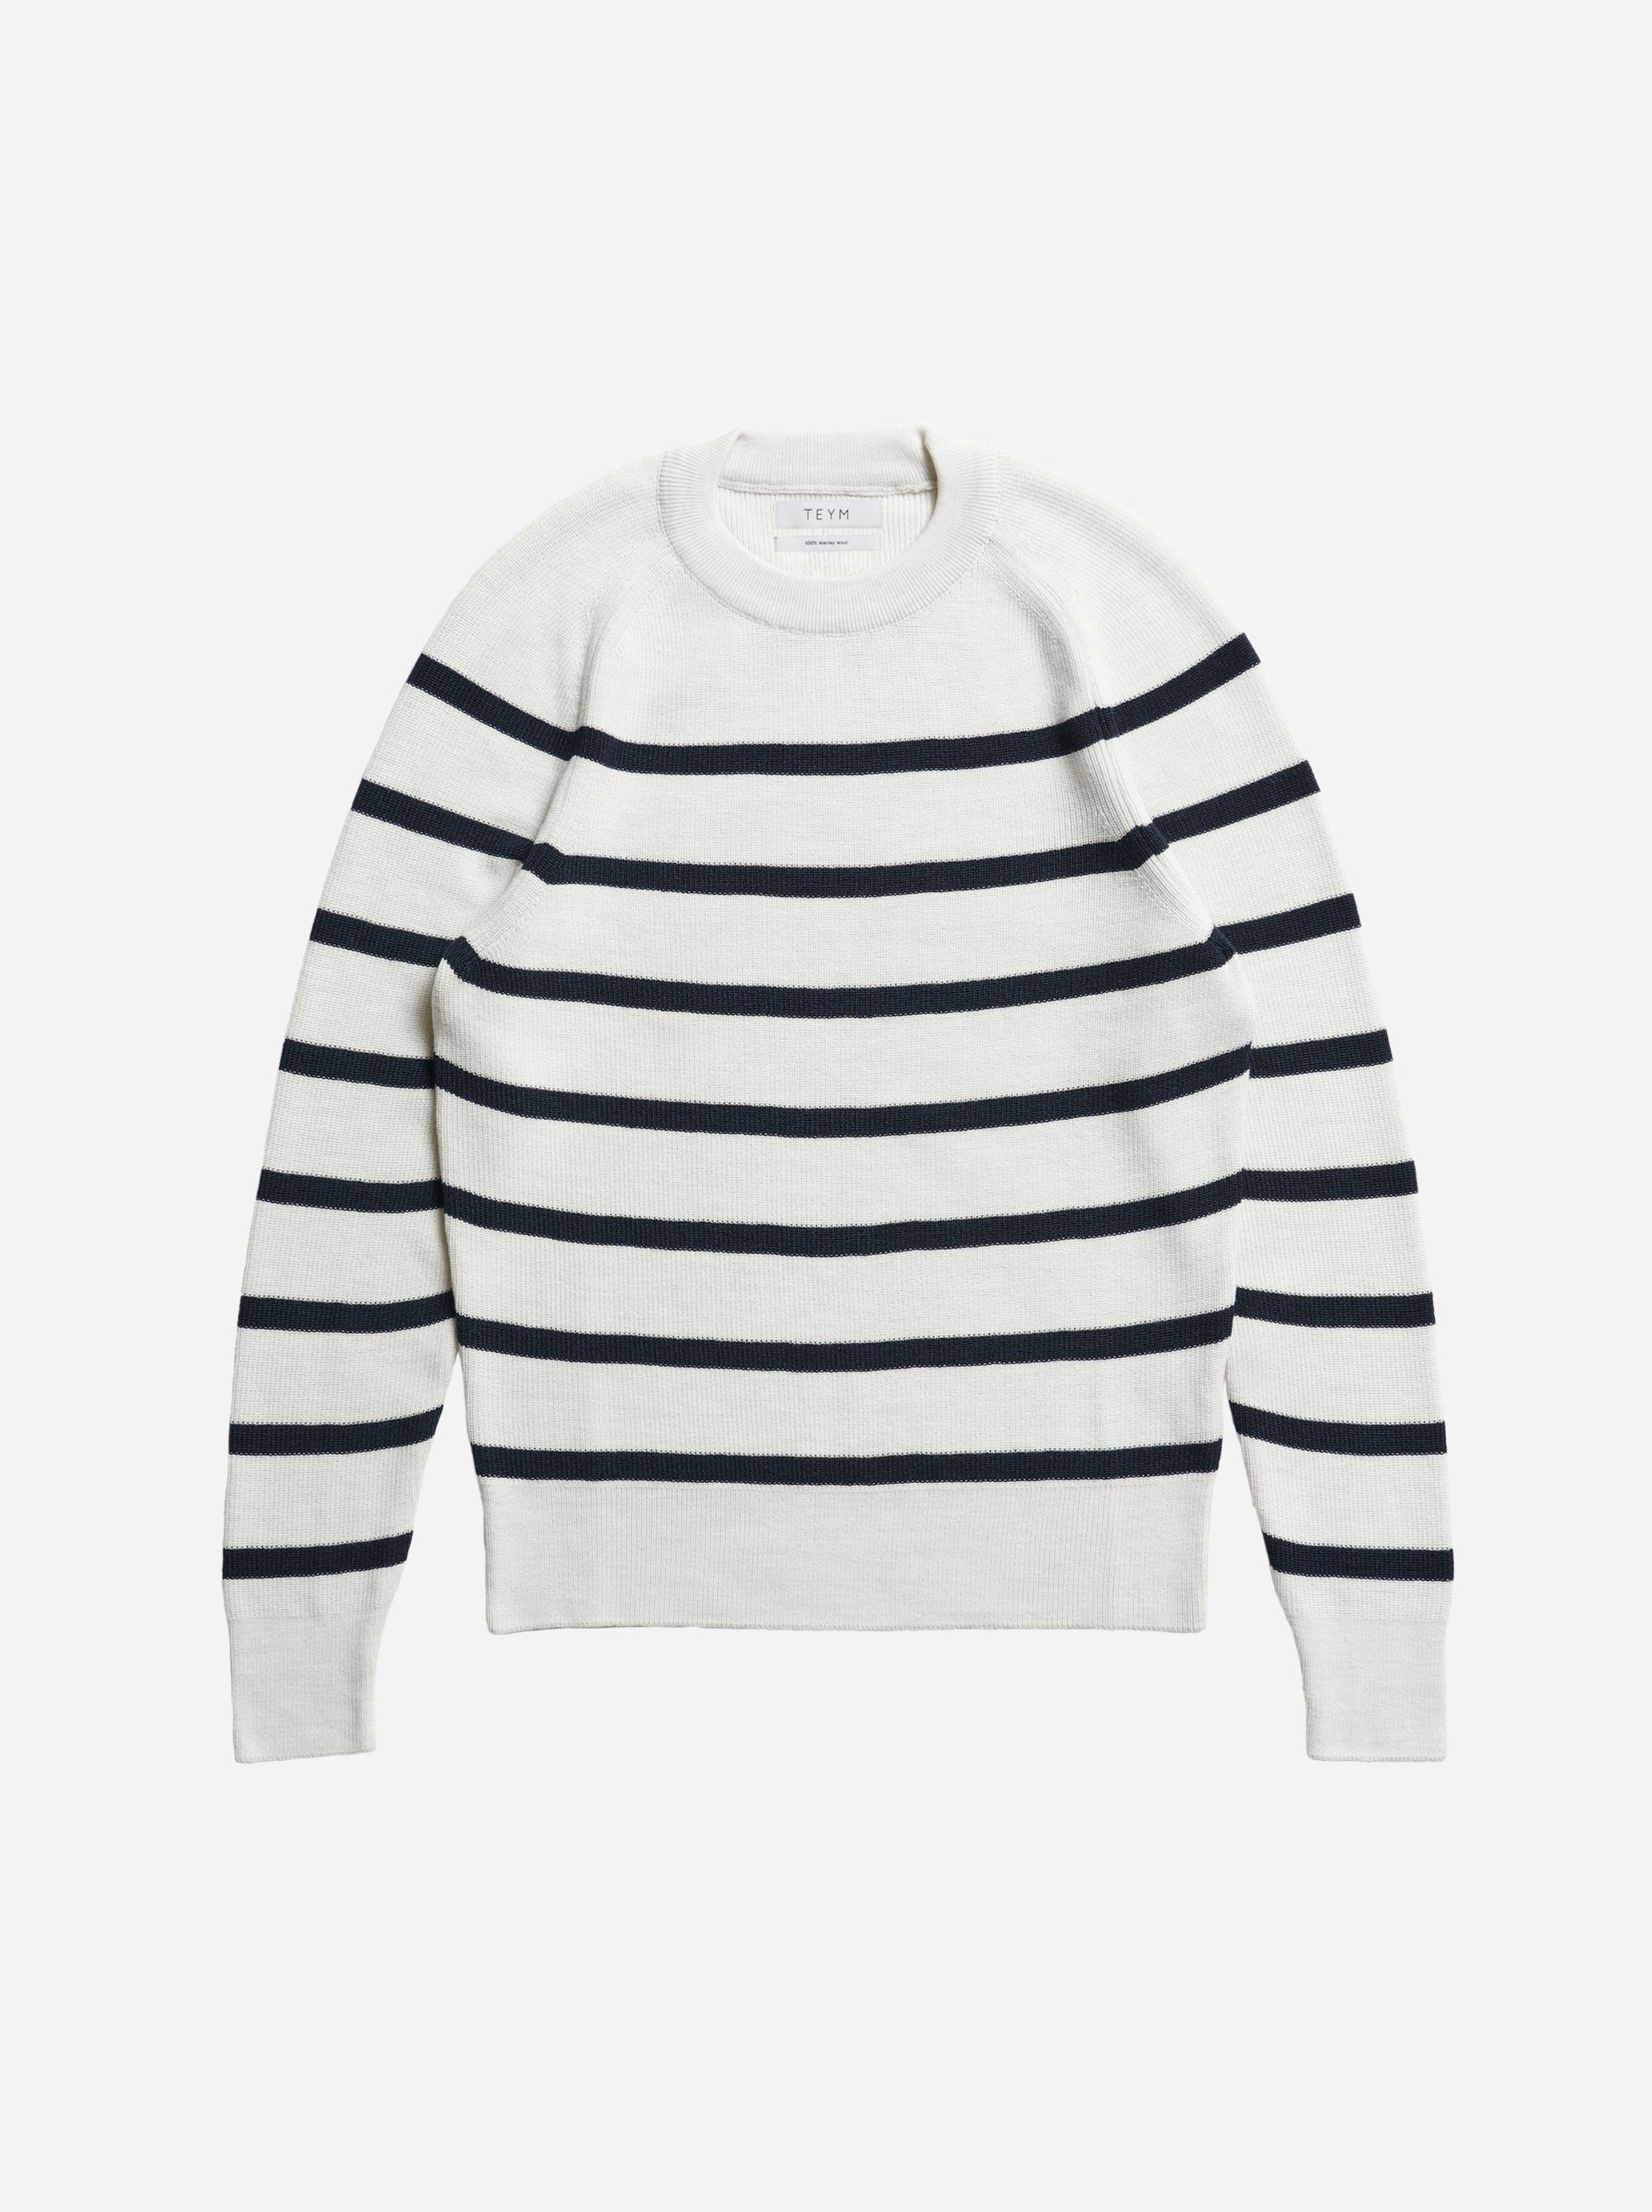 Teym - The Merino Sweater - Men - Striped - 4